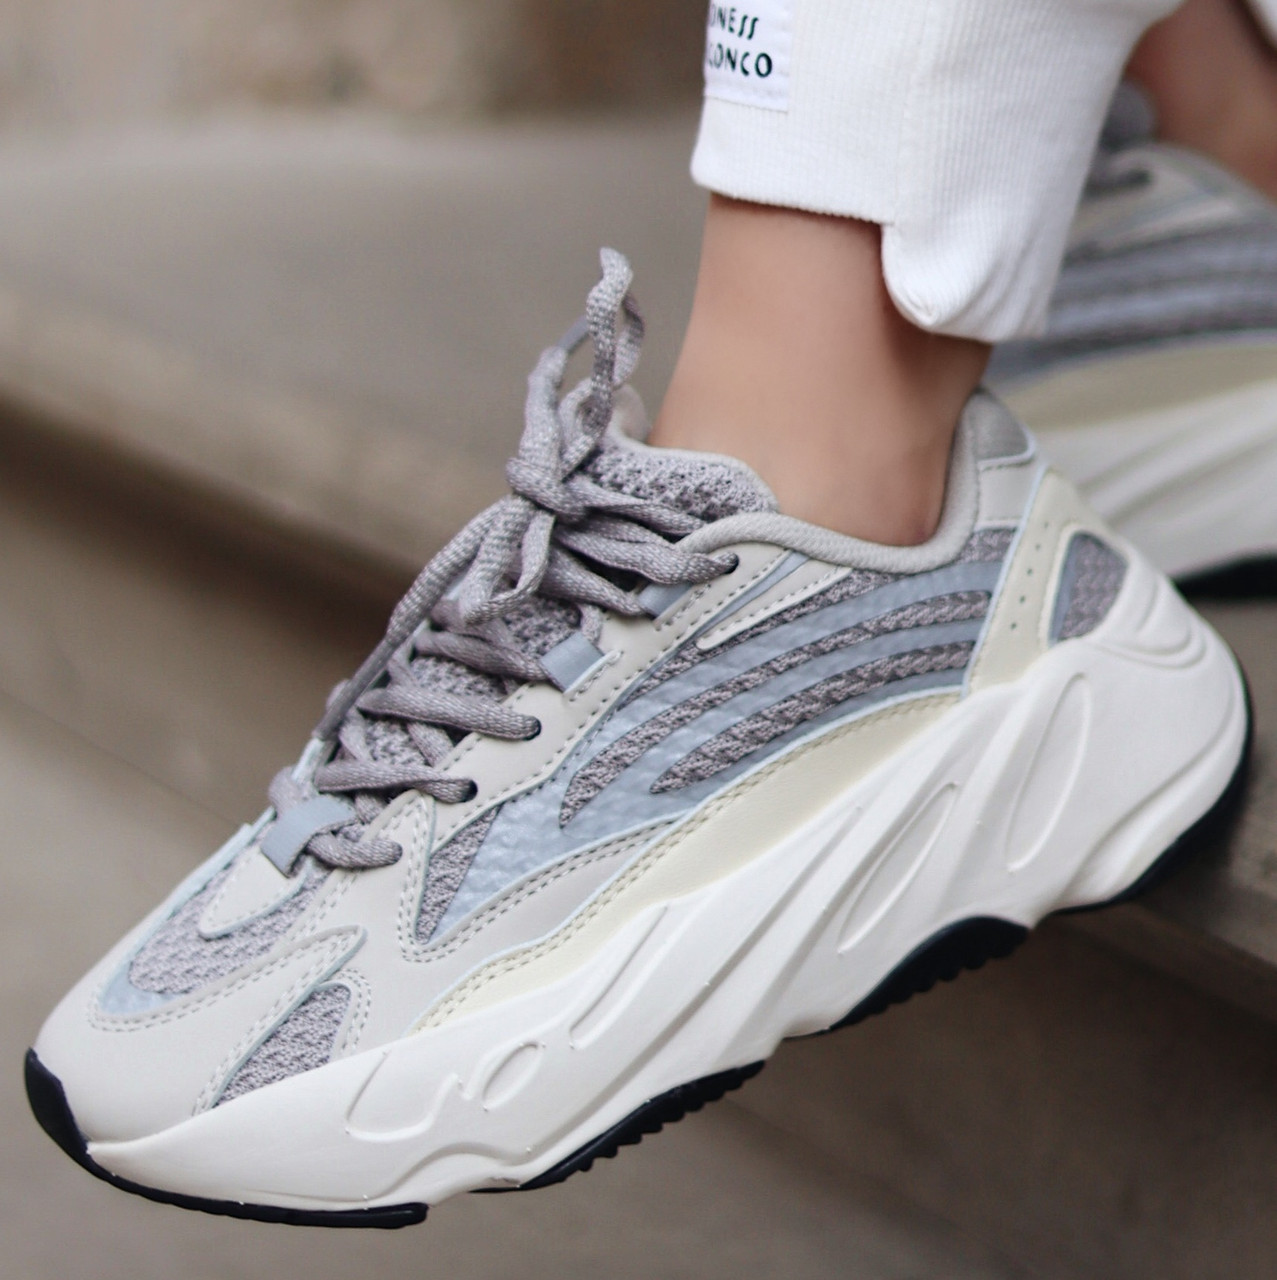 Мужские кроссовки Adidas Yeezy Wave Runner Boost 700 V2 Static